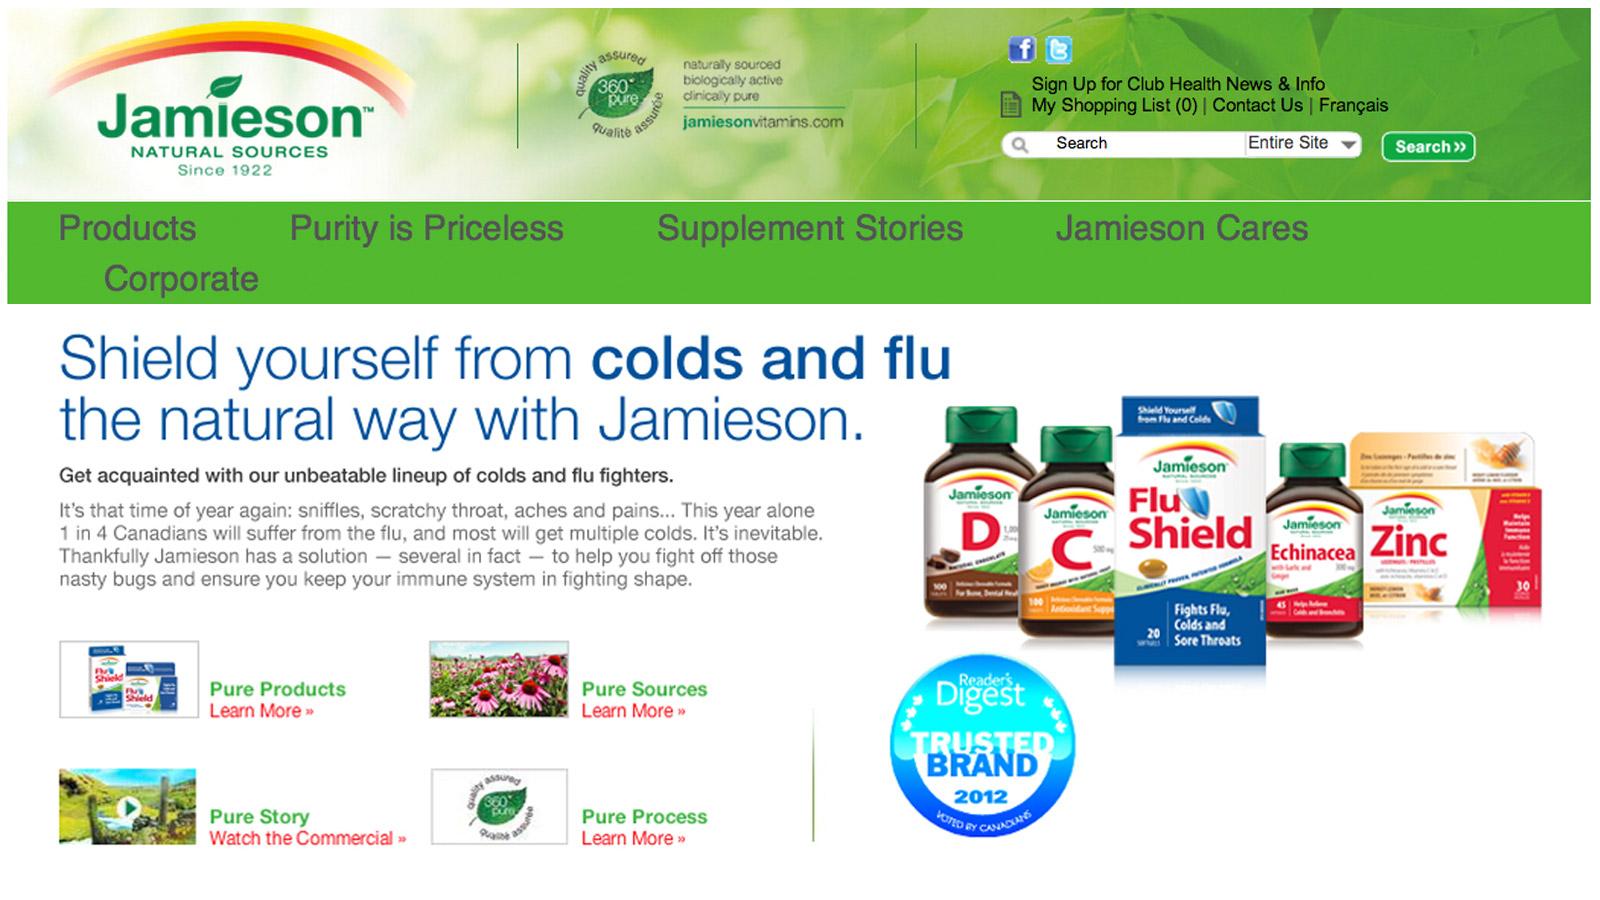 Jamieson Vitamins | FluShield Campaign | Brand Strategy, Digital Marketing, Website Design & Development